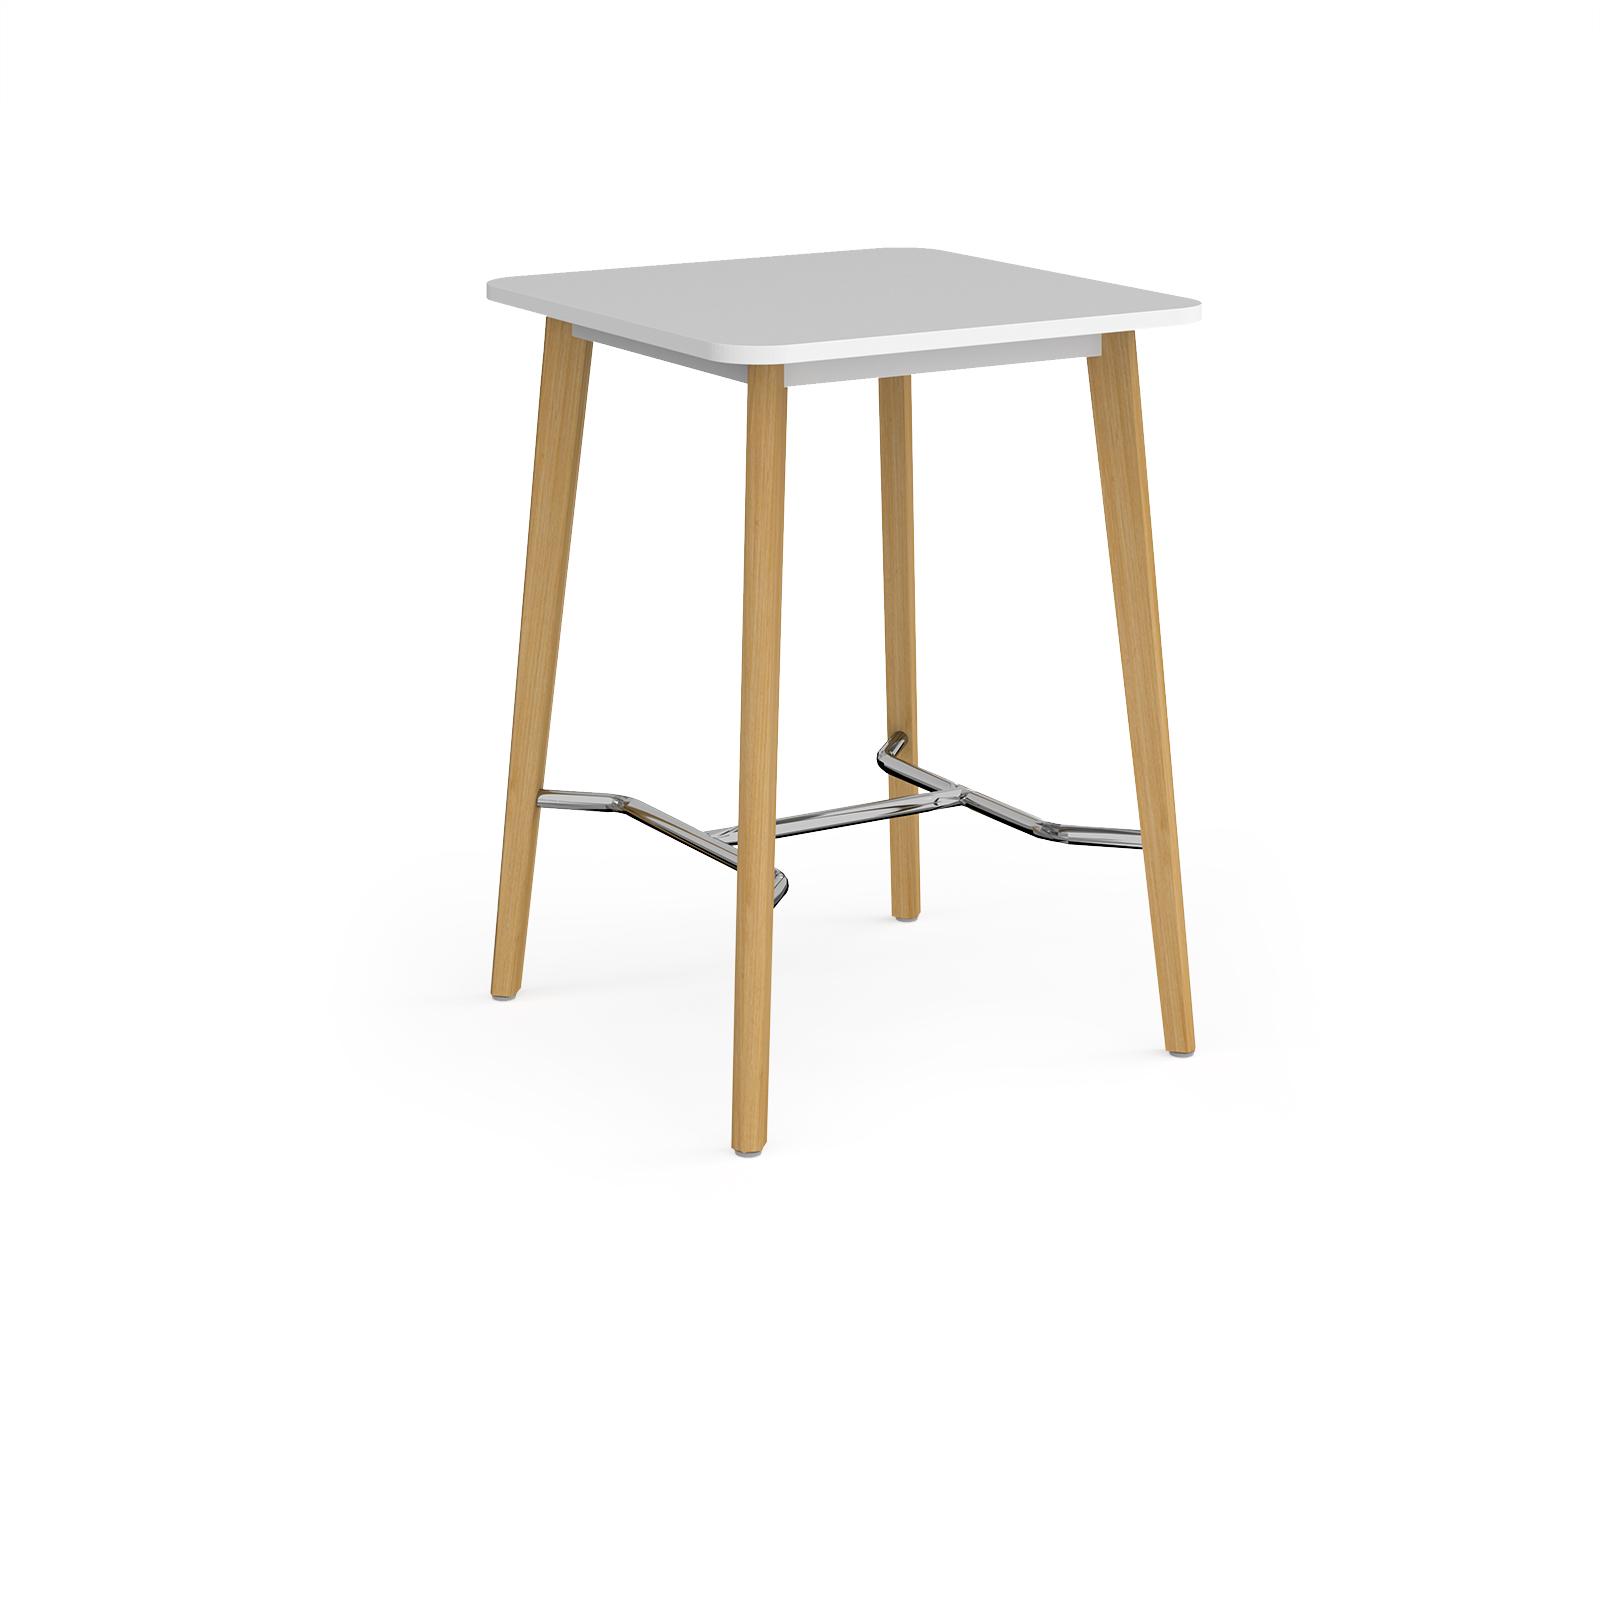 Como square poseur table with 4 oak legs 800mm - white